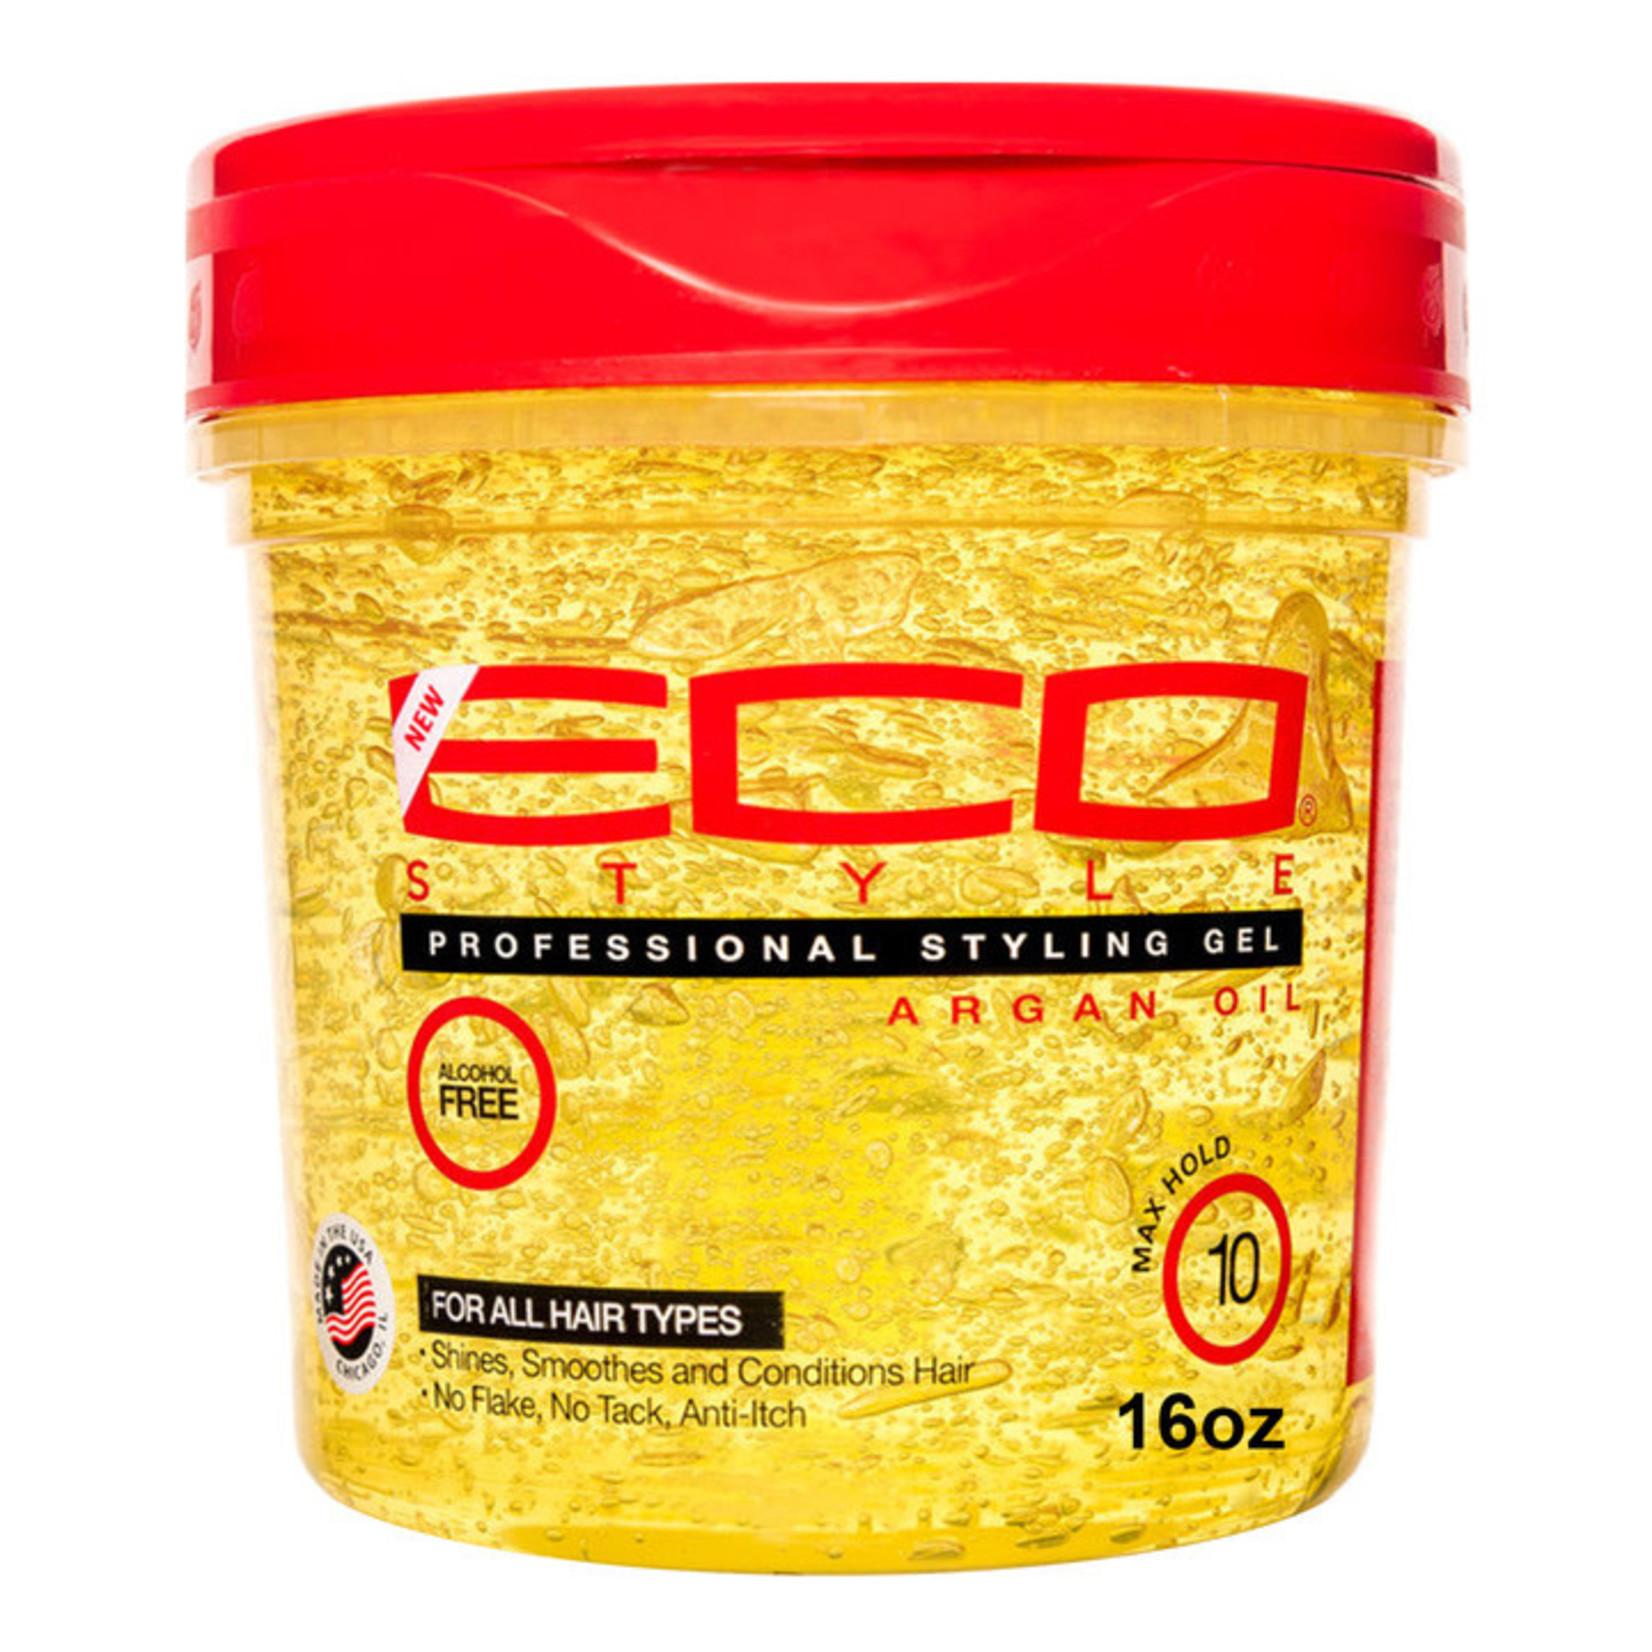 ECO STYLE ECO STYLING GEL - ARGAN OIL [16 OZ]